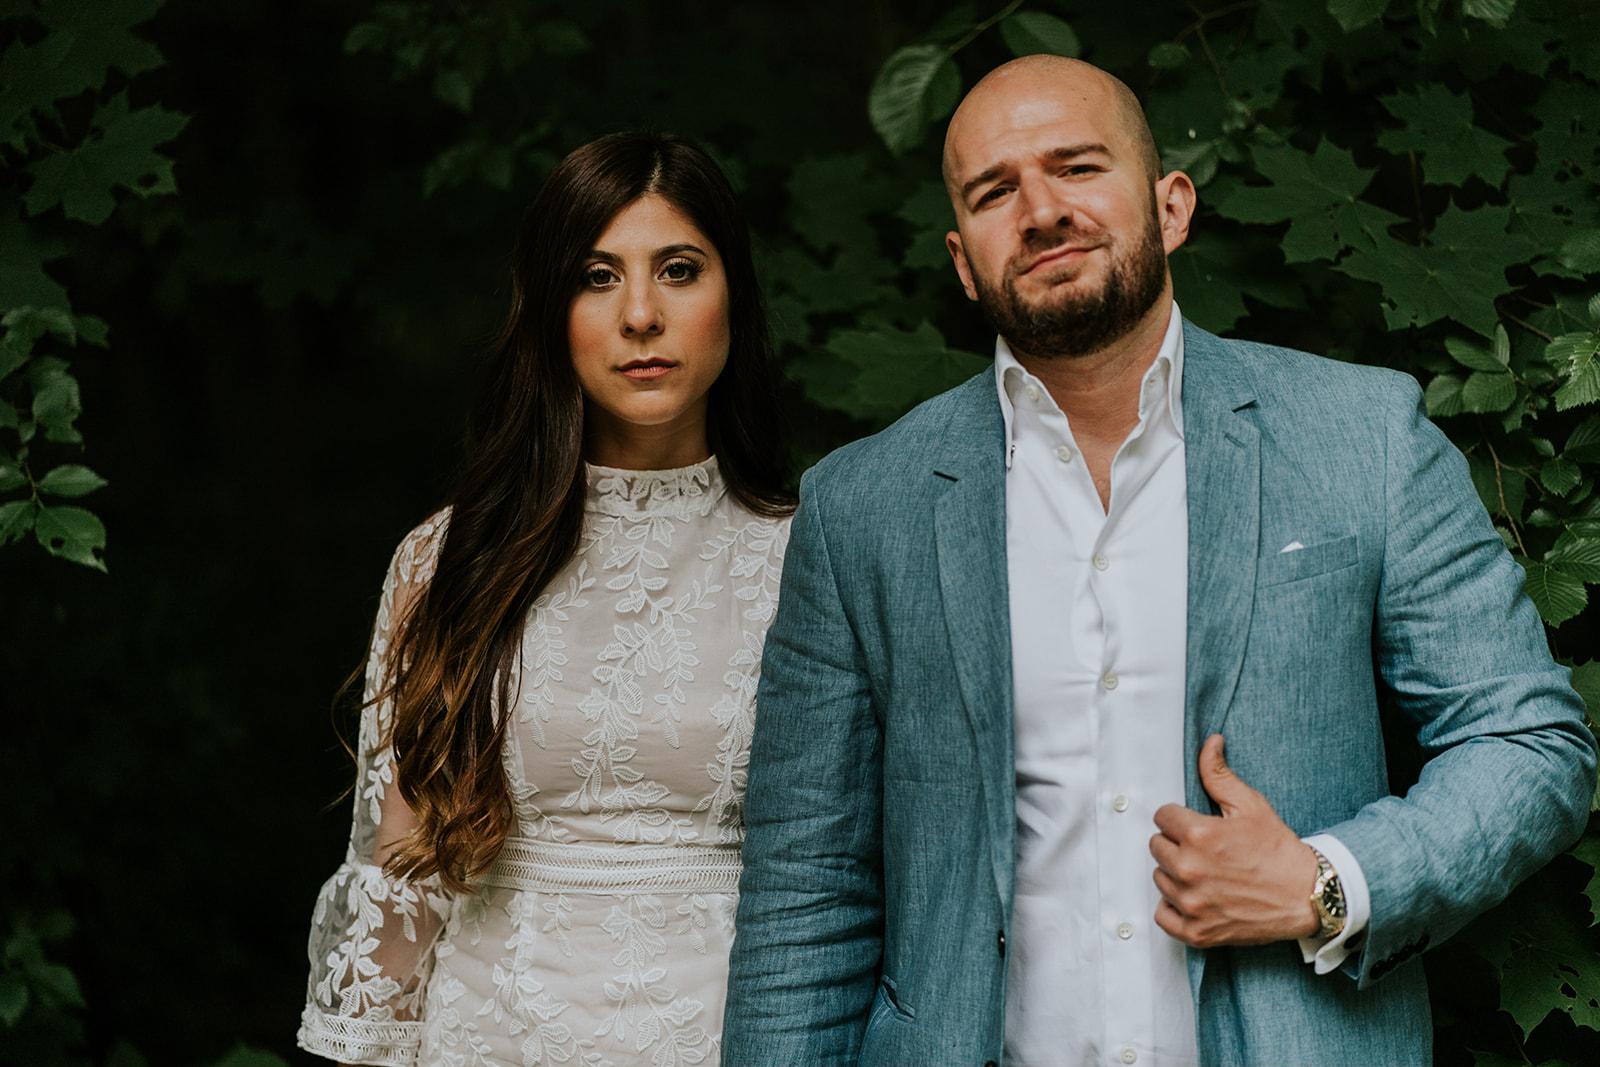 Sabri-photographe-sayde-_-george-wedding-351.jpg